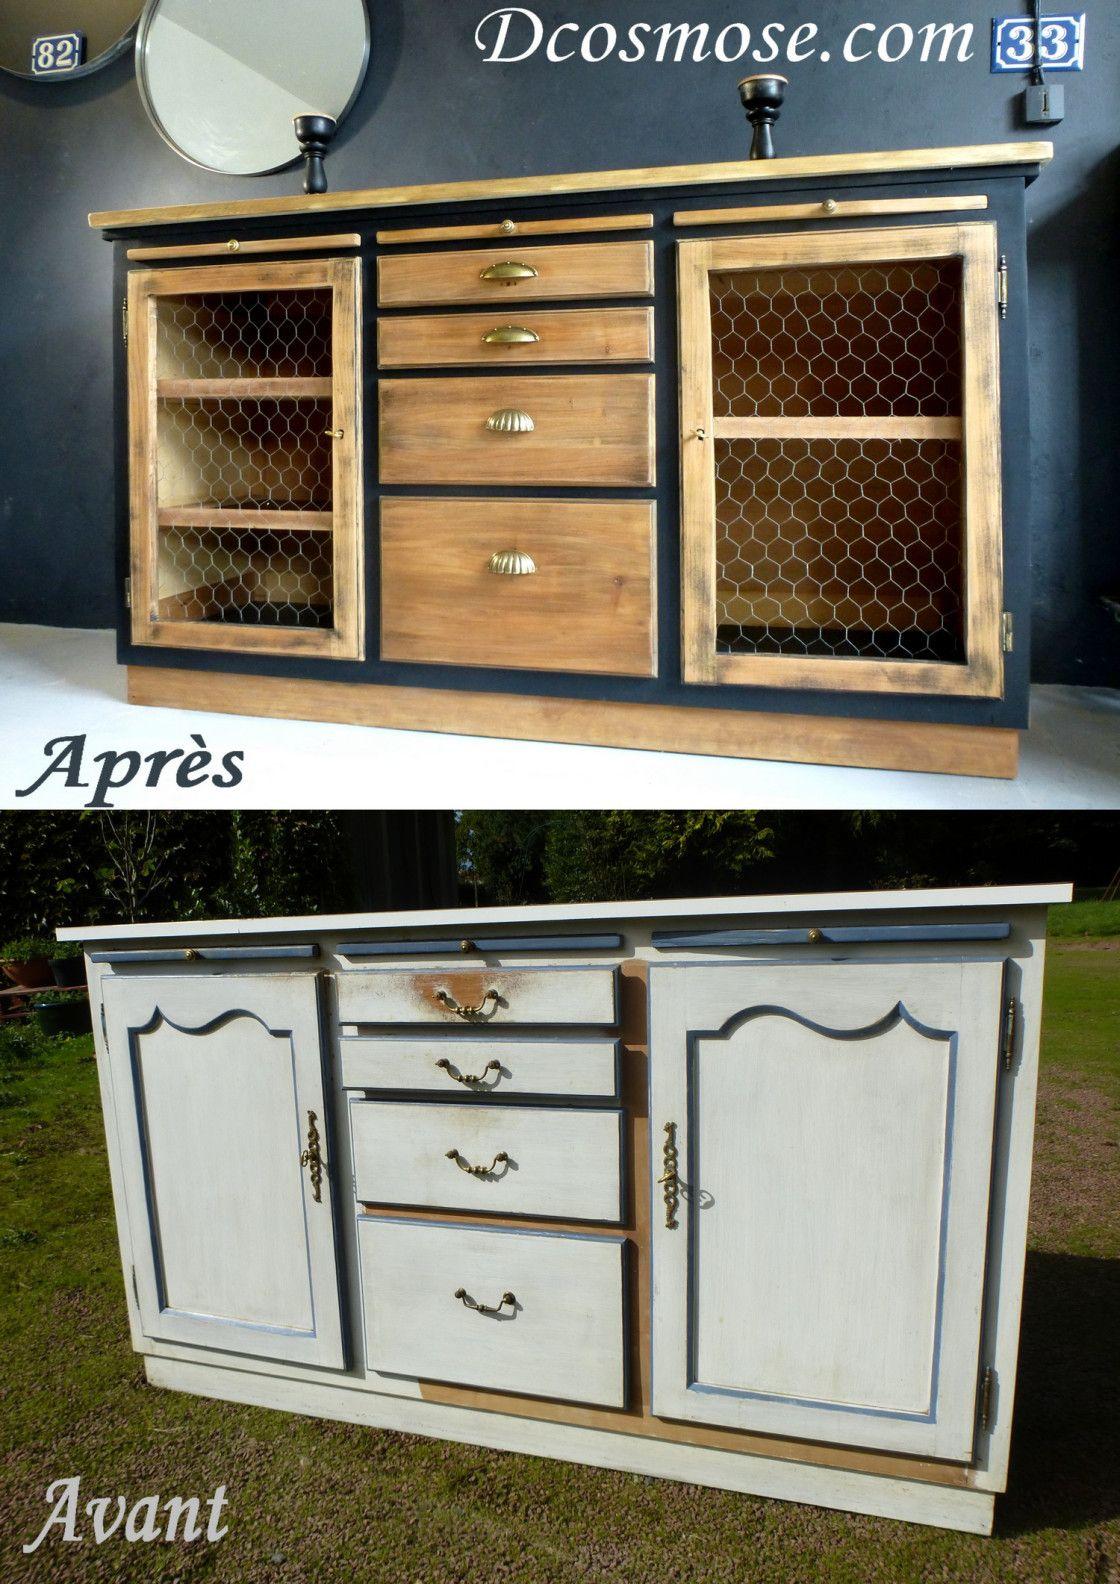 Avant apr s bahut bistrot relooking meubles dekor weinkeller bauen et landhaus - Relooking vieux meubles ...